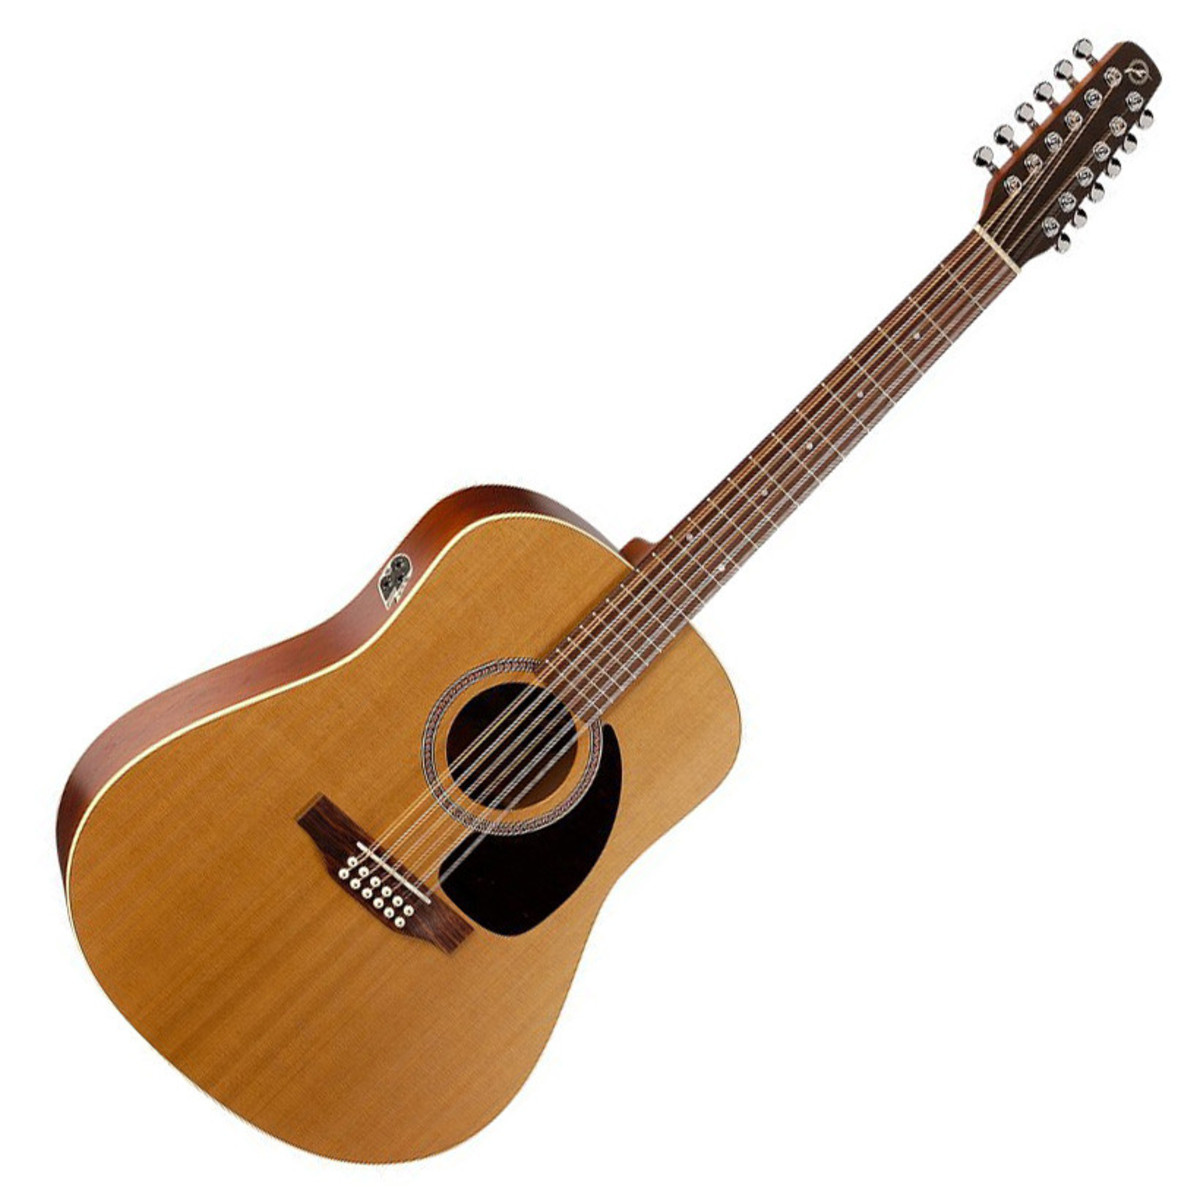 seagull coastline s12 cedar qi 12 string electro acoustic guitar at. Black Bedroom Furniture Sets. Home Design Ideas